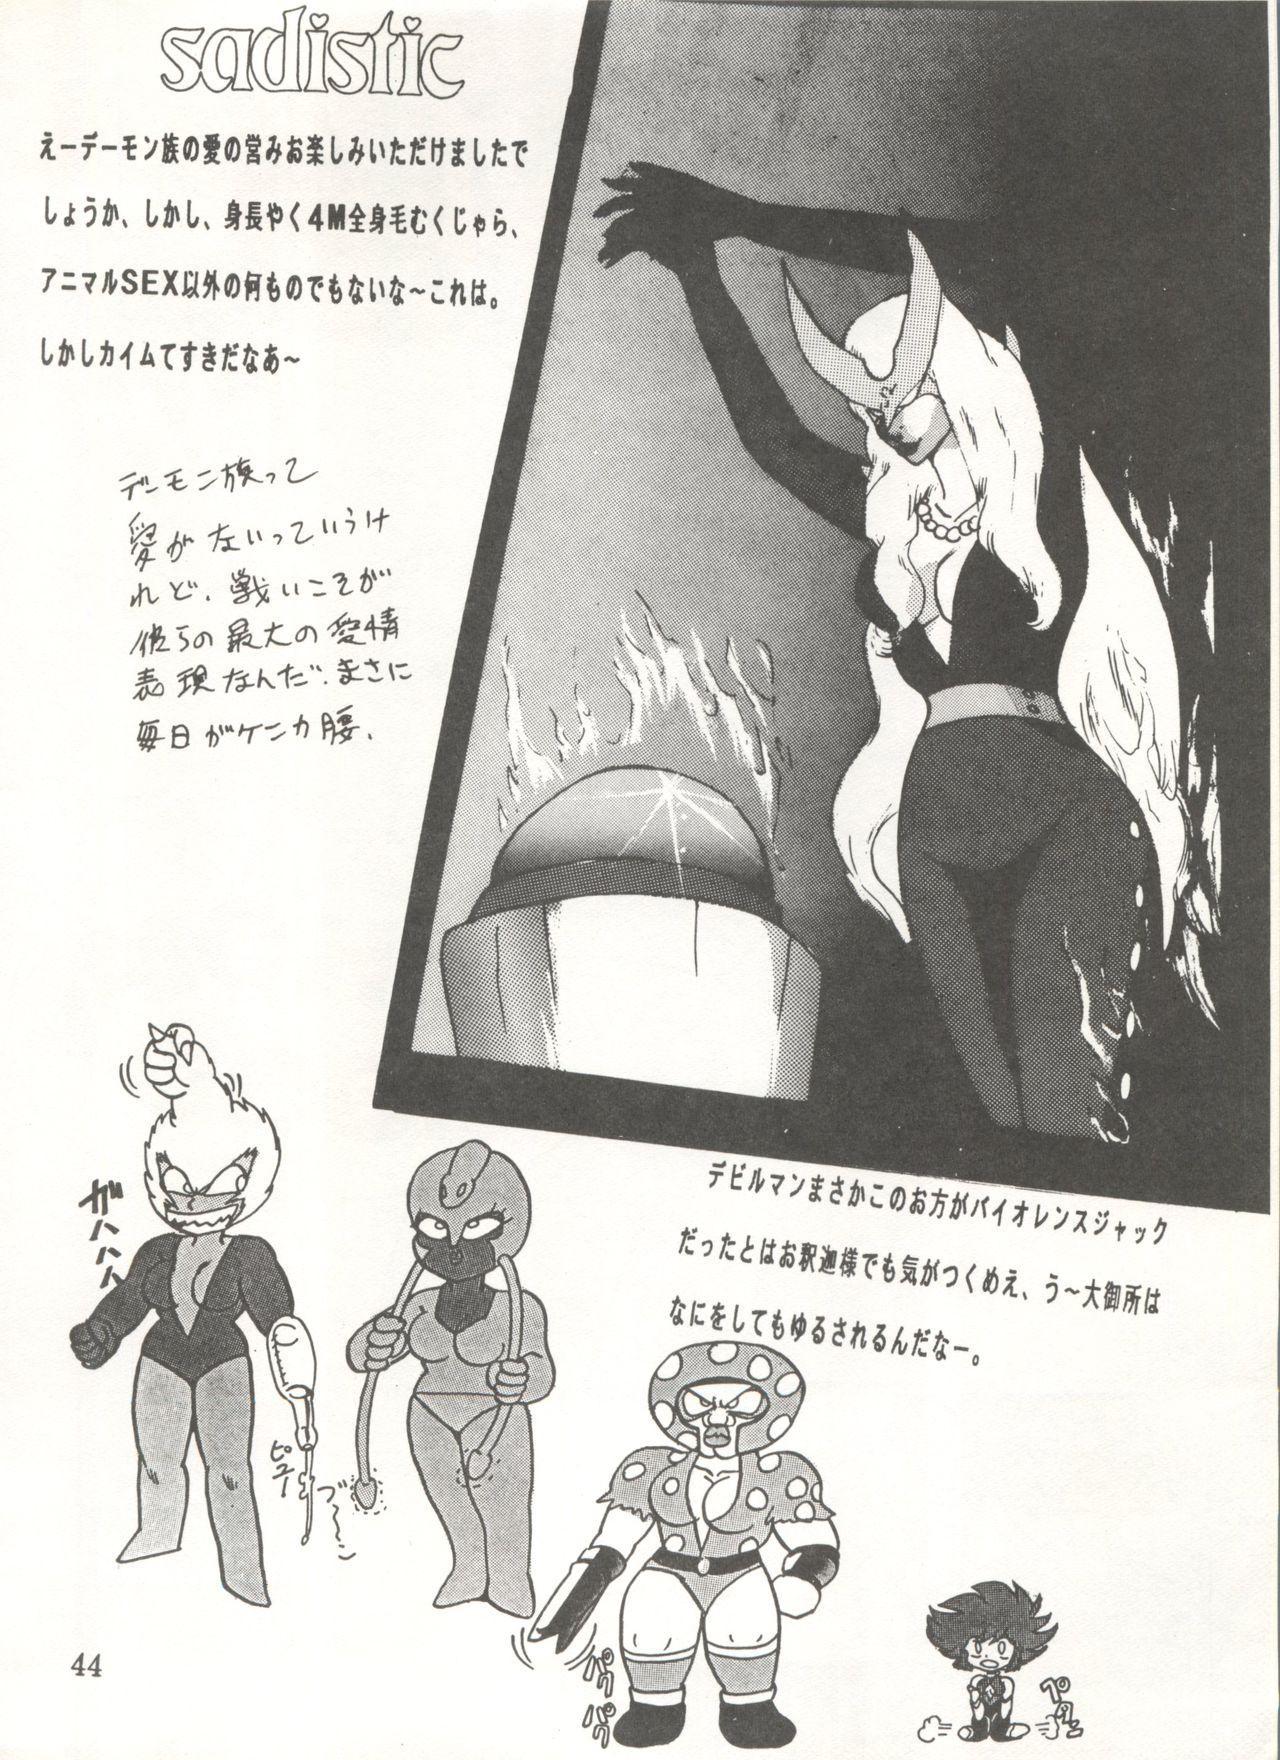 [Global One (MARO)] Sadistic 5 (Cutey Honey, Devilman, Sailor Moon), [Global One (MARO)] Sadistic (Dirty Pair, Fushigi no Umi no Nadia, Sailor Moon), [Studio Ikkatsumajin] .ribbon (Hime-chan's Ribbon) 43